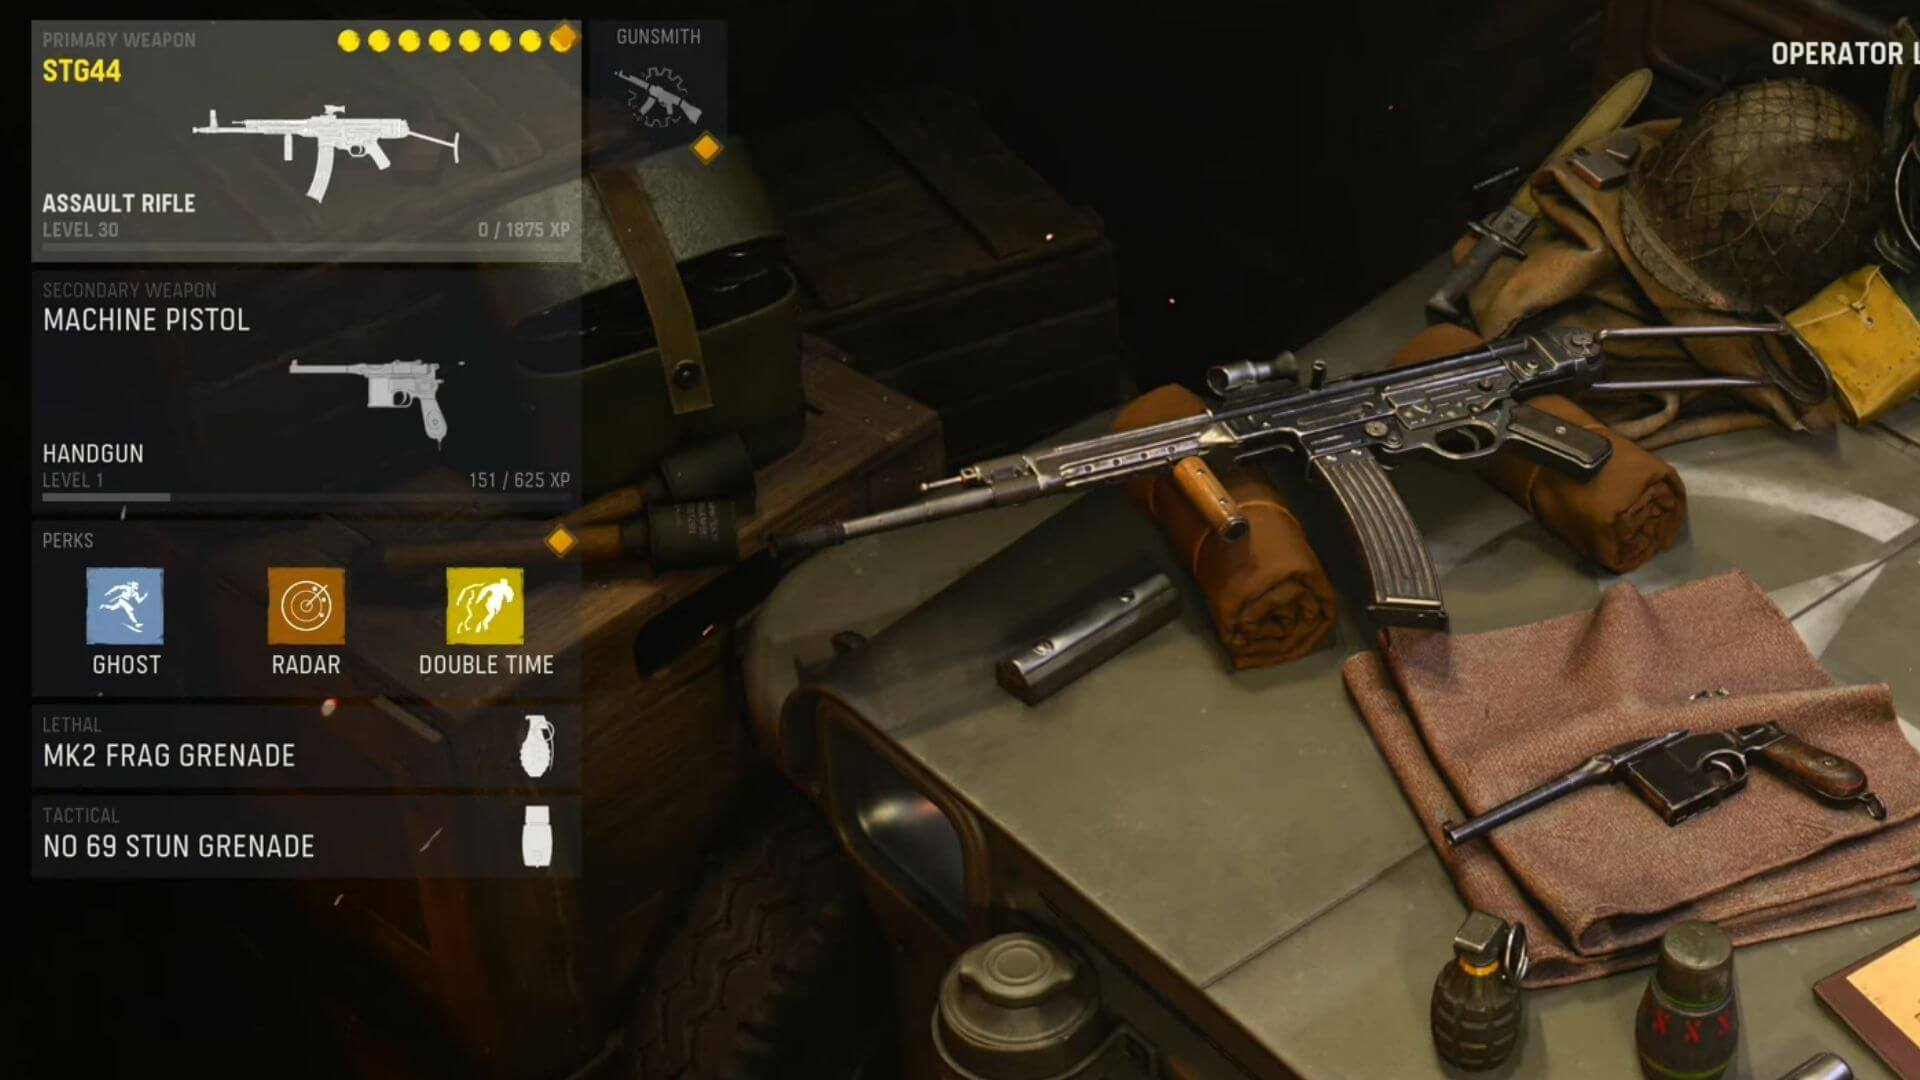 Best-STG44-loadout-for-CoD-Vanguard-Beta-PIC-1-GamersRD